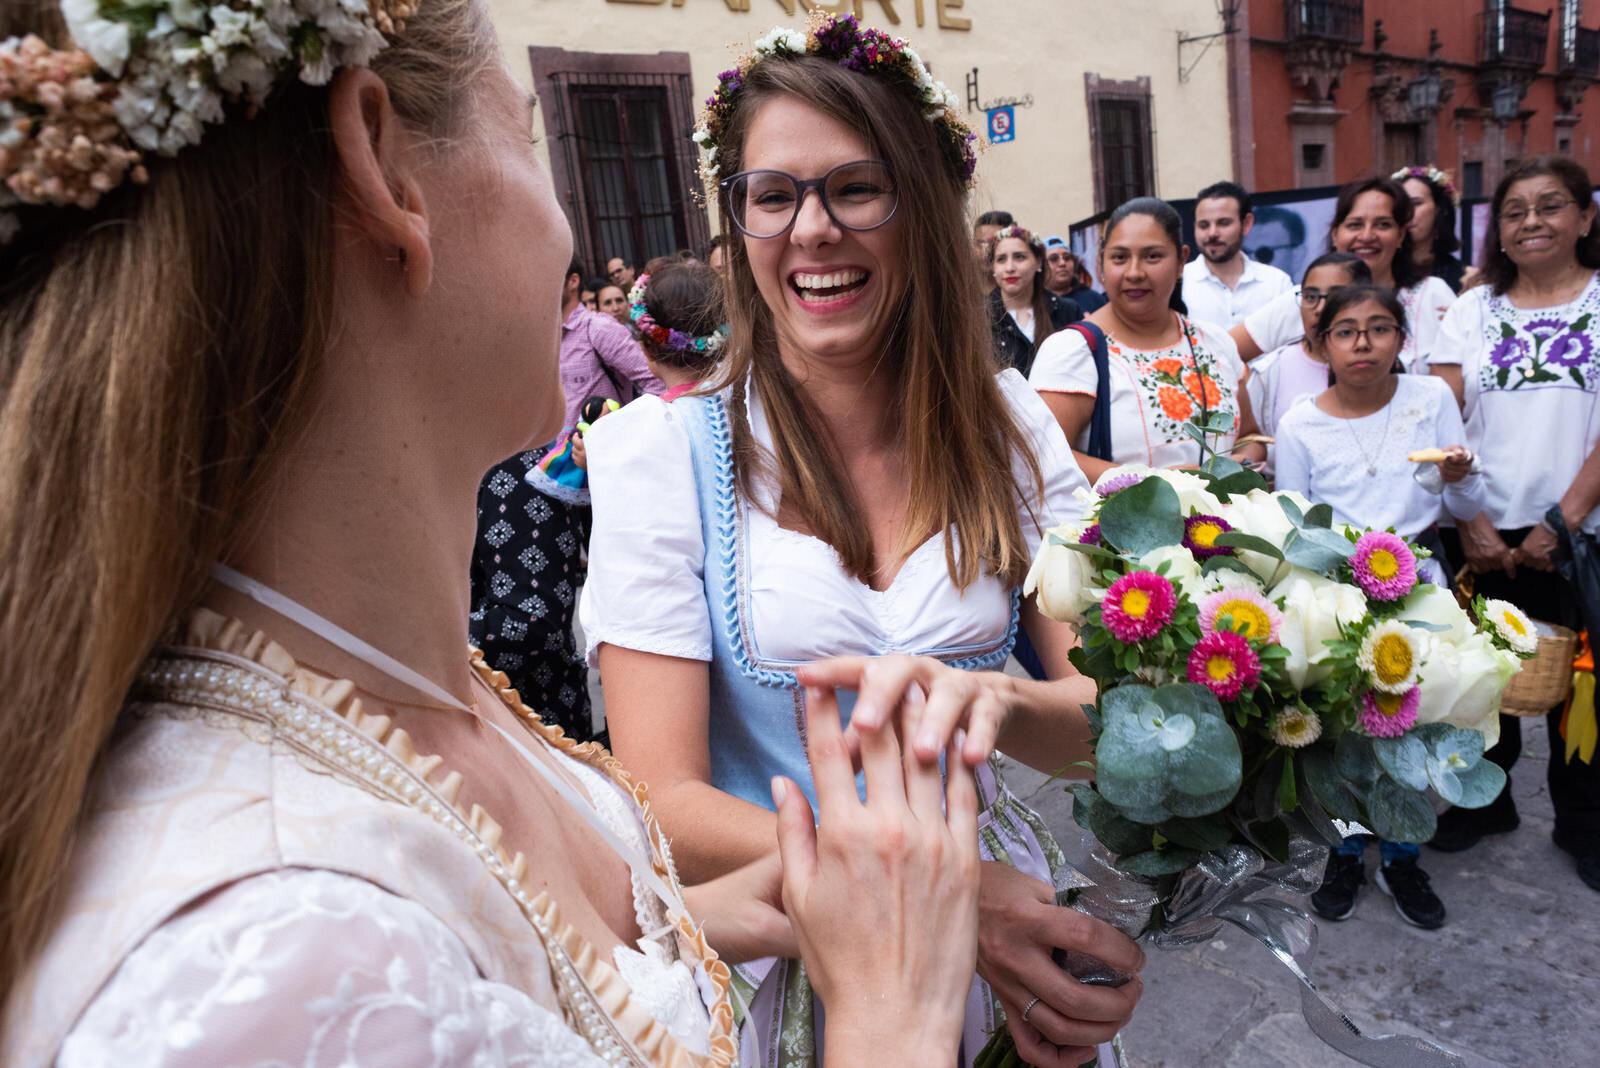 callejoneada_san_miguel_de_allende_wedding_photography_ (13).jpg